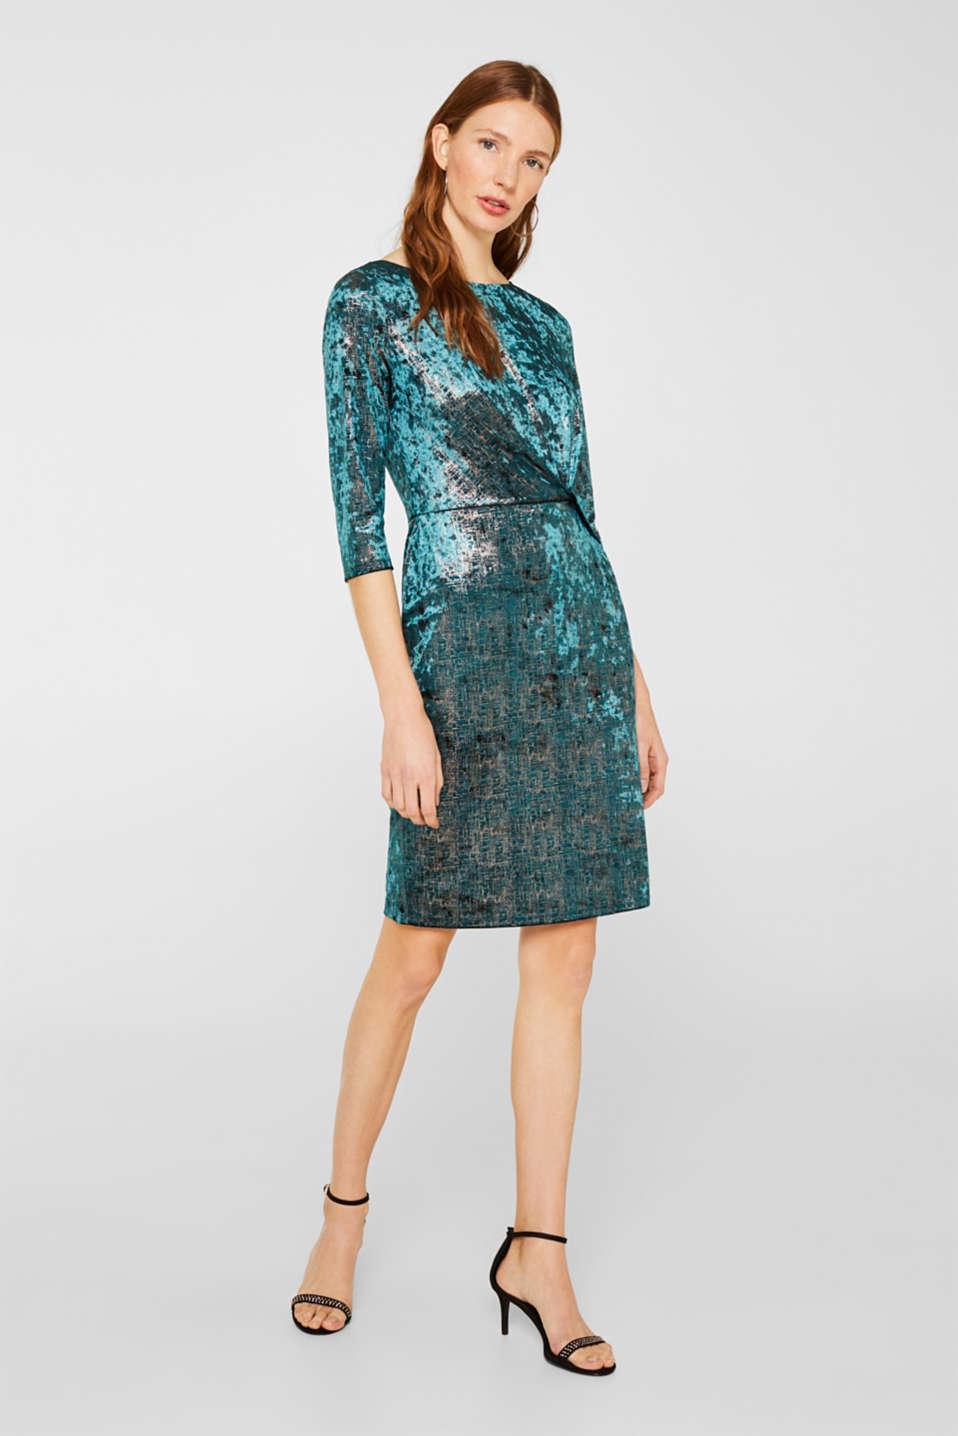 Dresses knitted, DARK TEAL GREEN, detail image number 1